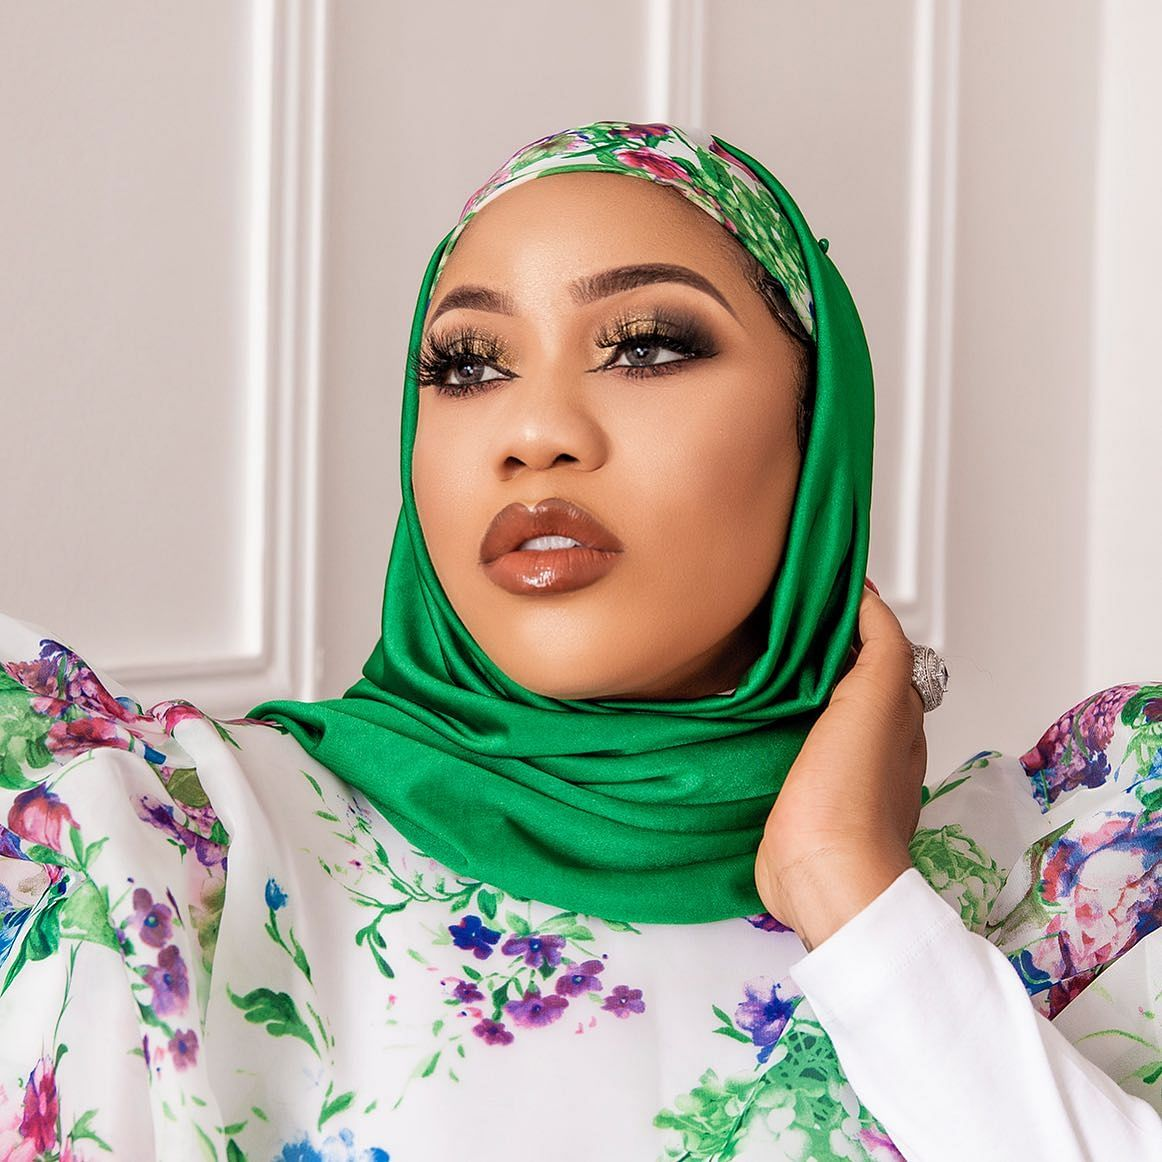 Eid-el-Fitr: Toyin Lawani dares fans, recreates hijab-version of racy nun outfit